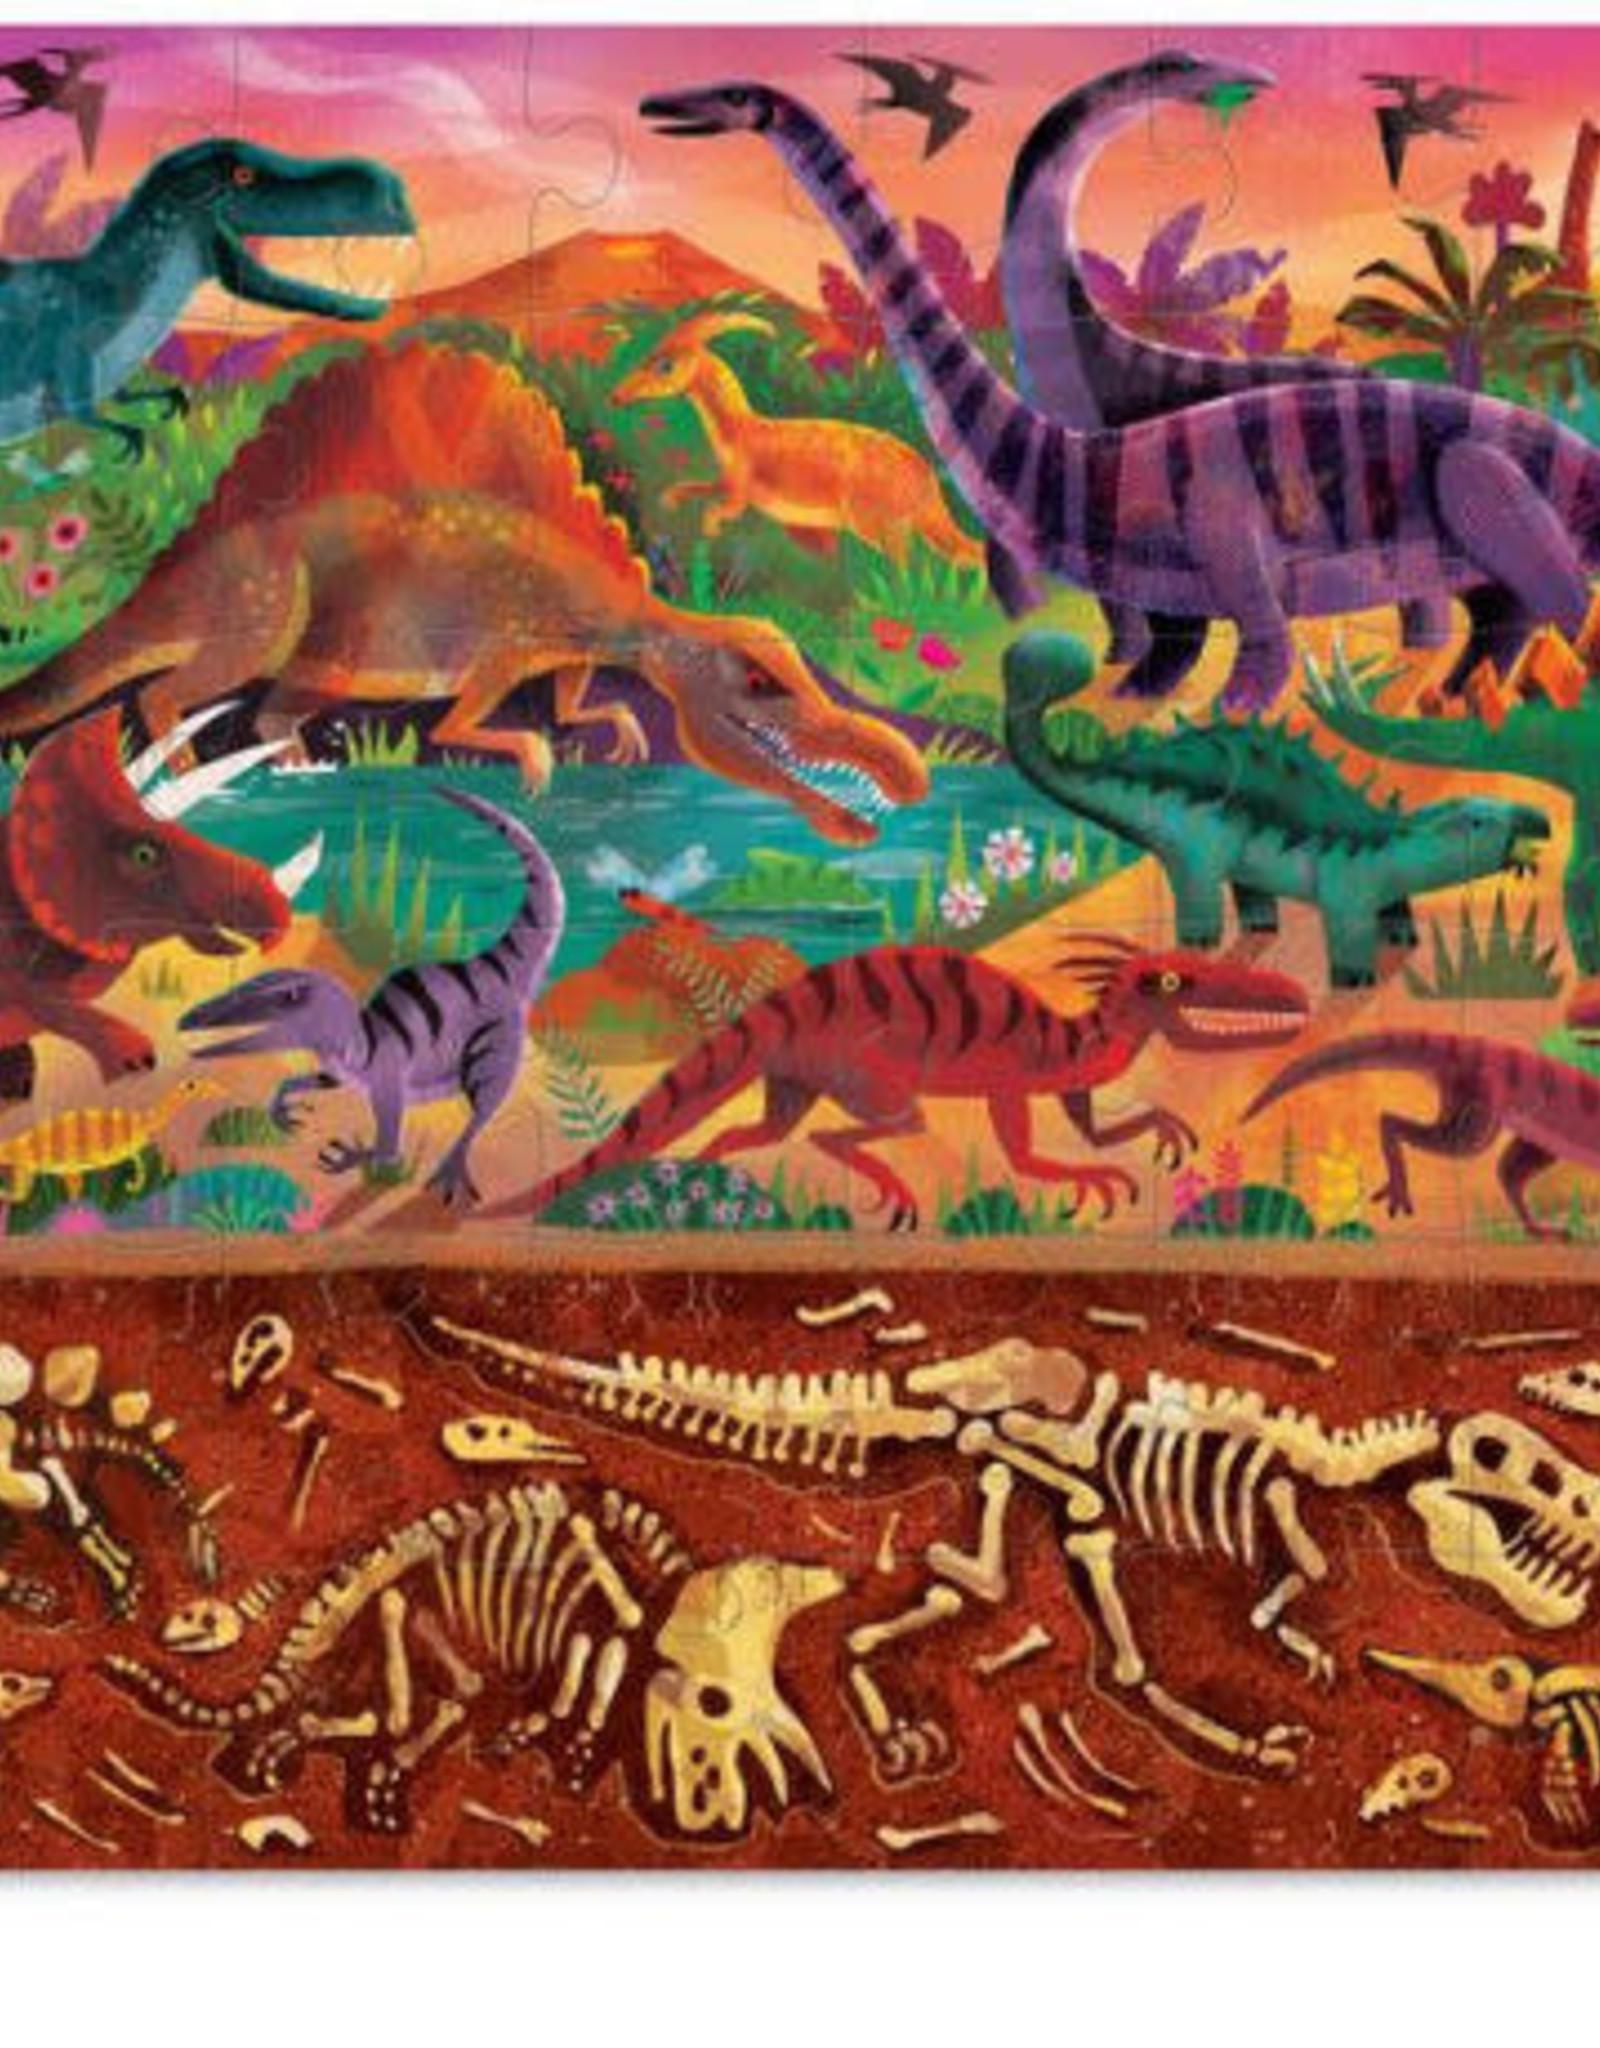 Crocodile Creek 48 pc Puzzle Above and Below: Dinosaur World